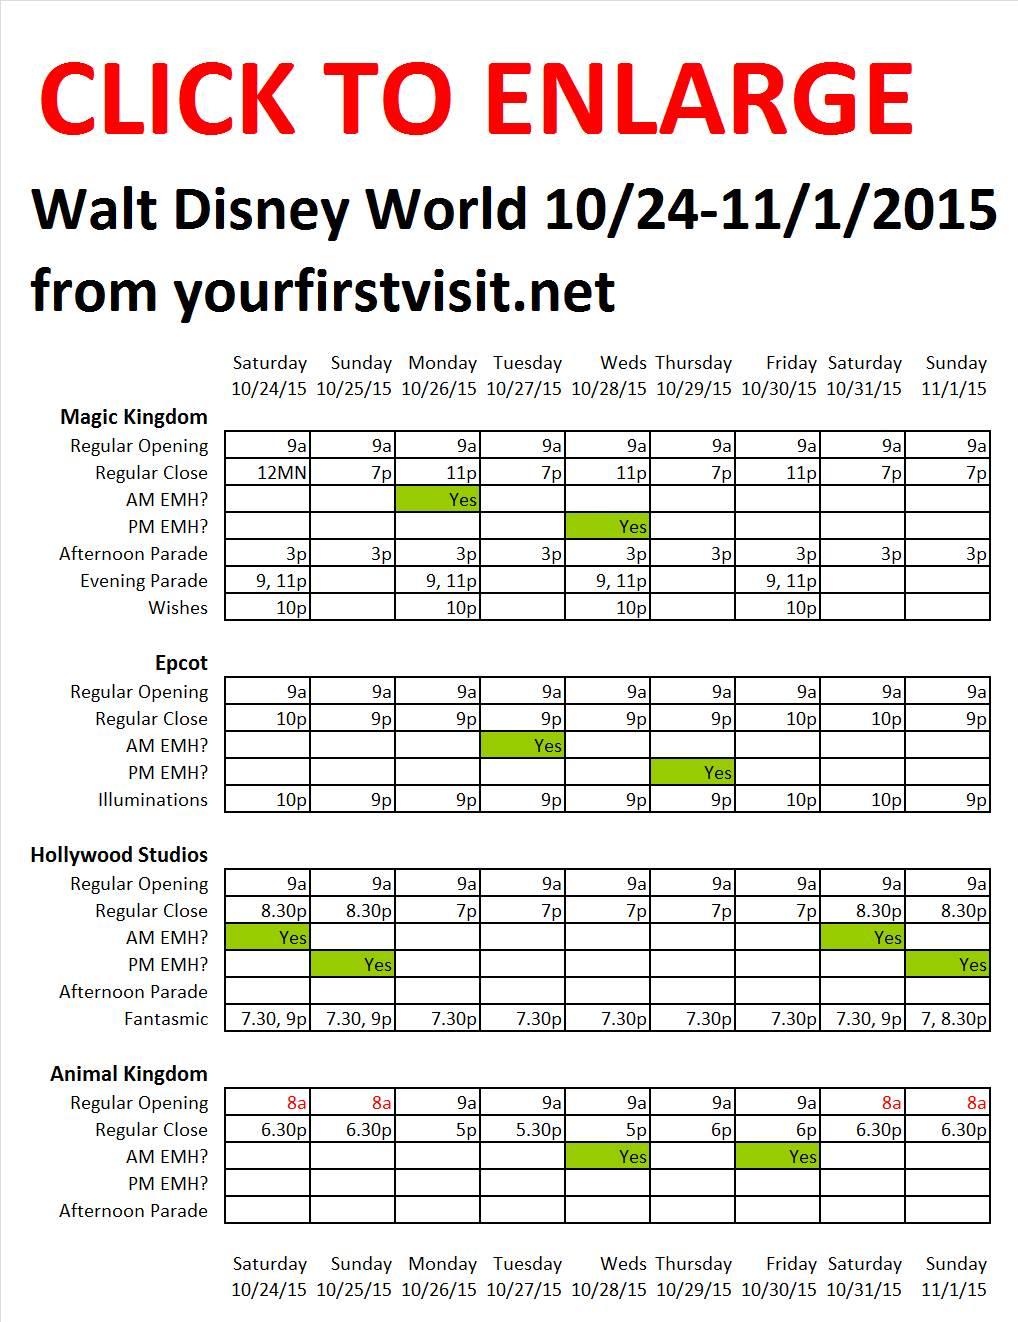 Disney World 10-24 to 11-1- 2015 from yourfirstvisit.net